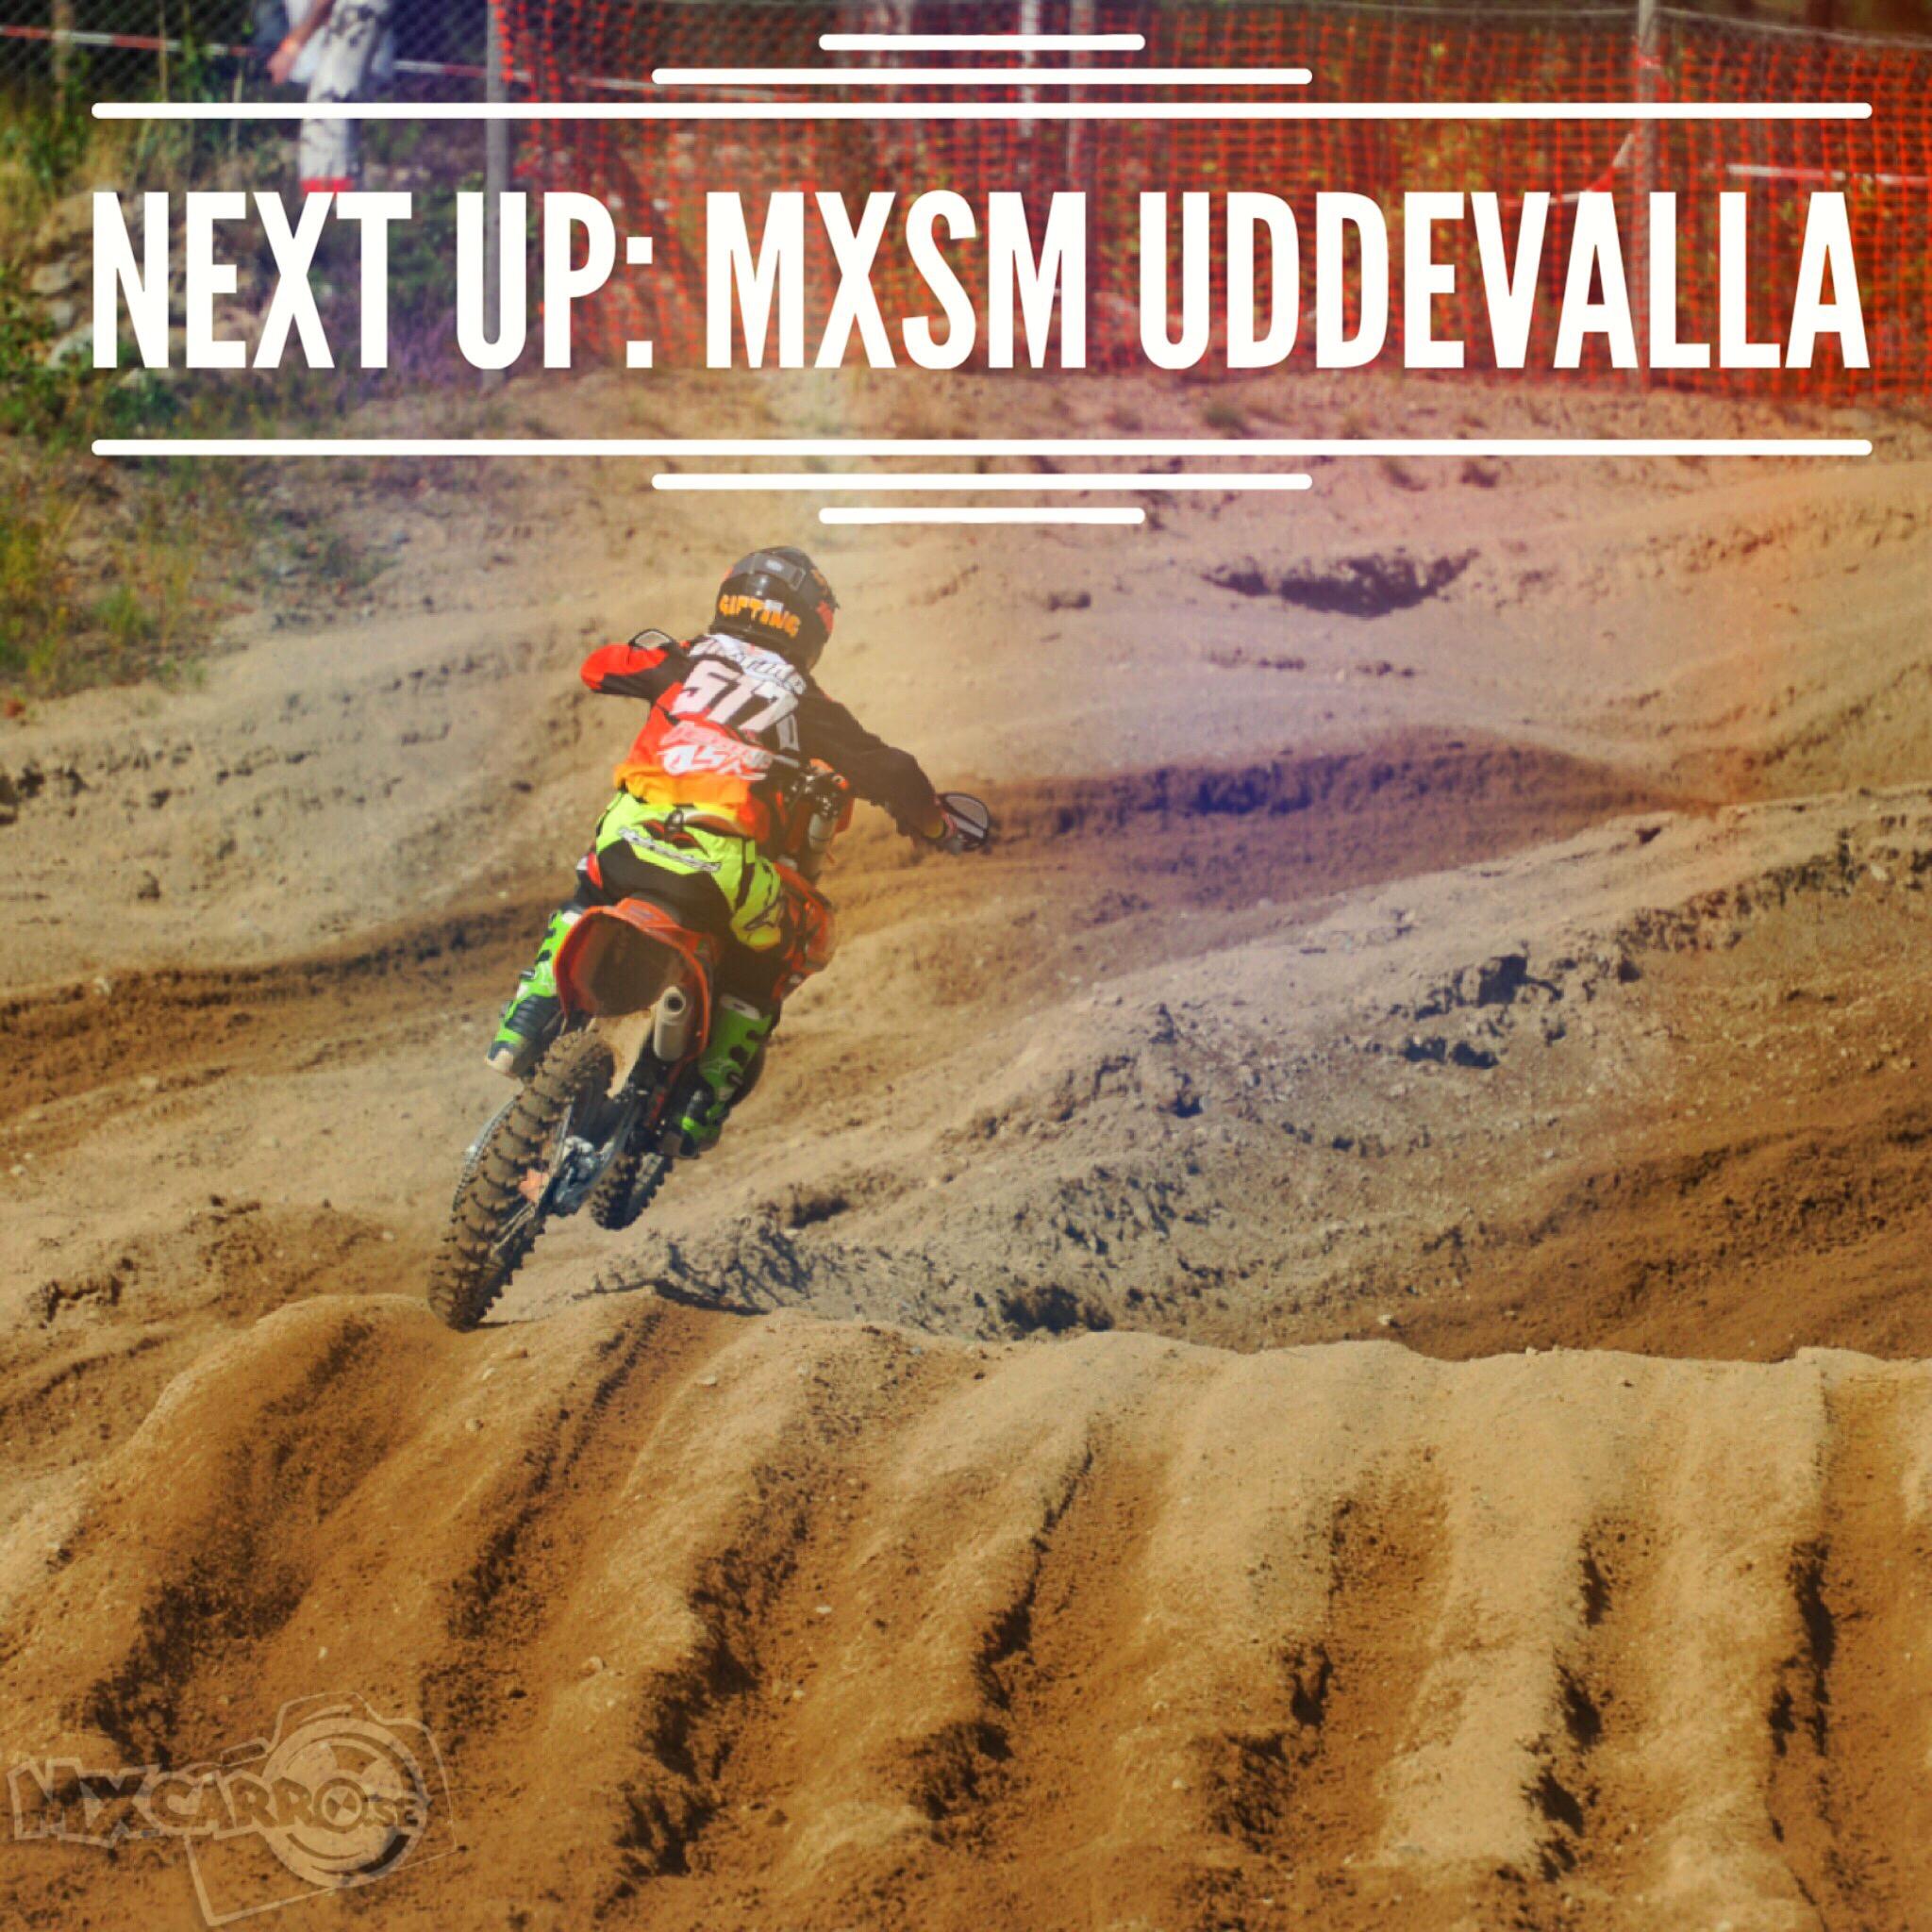 NEXT UP: MXSM Uddevalla